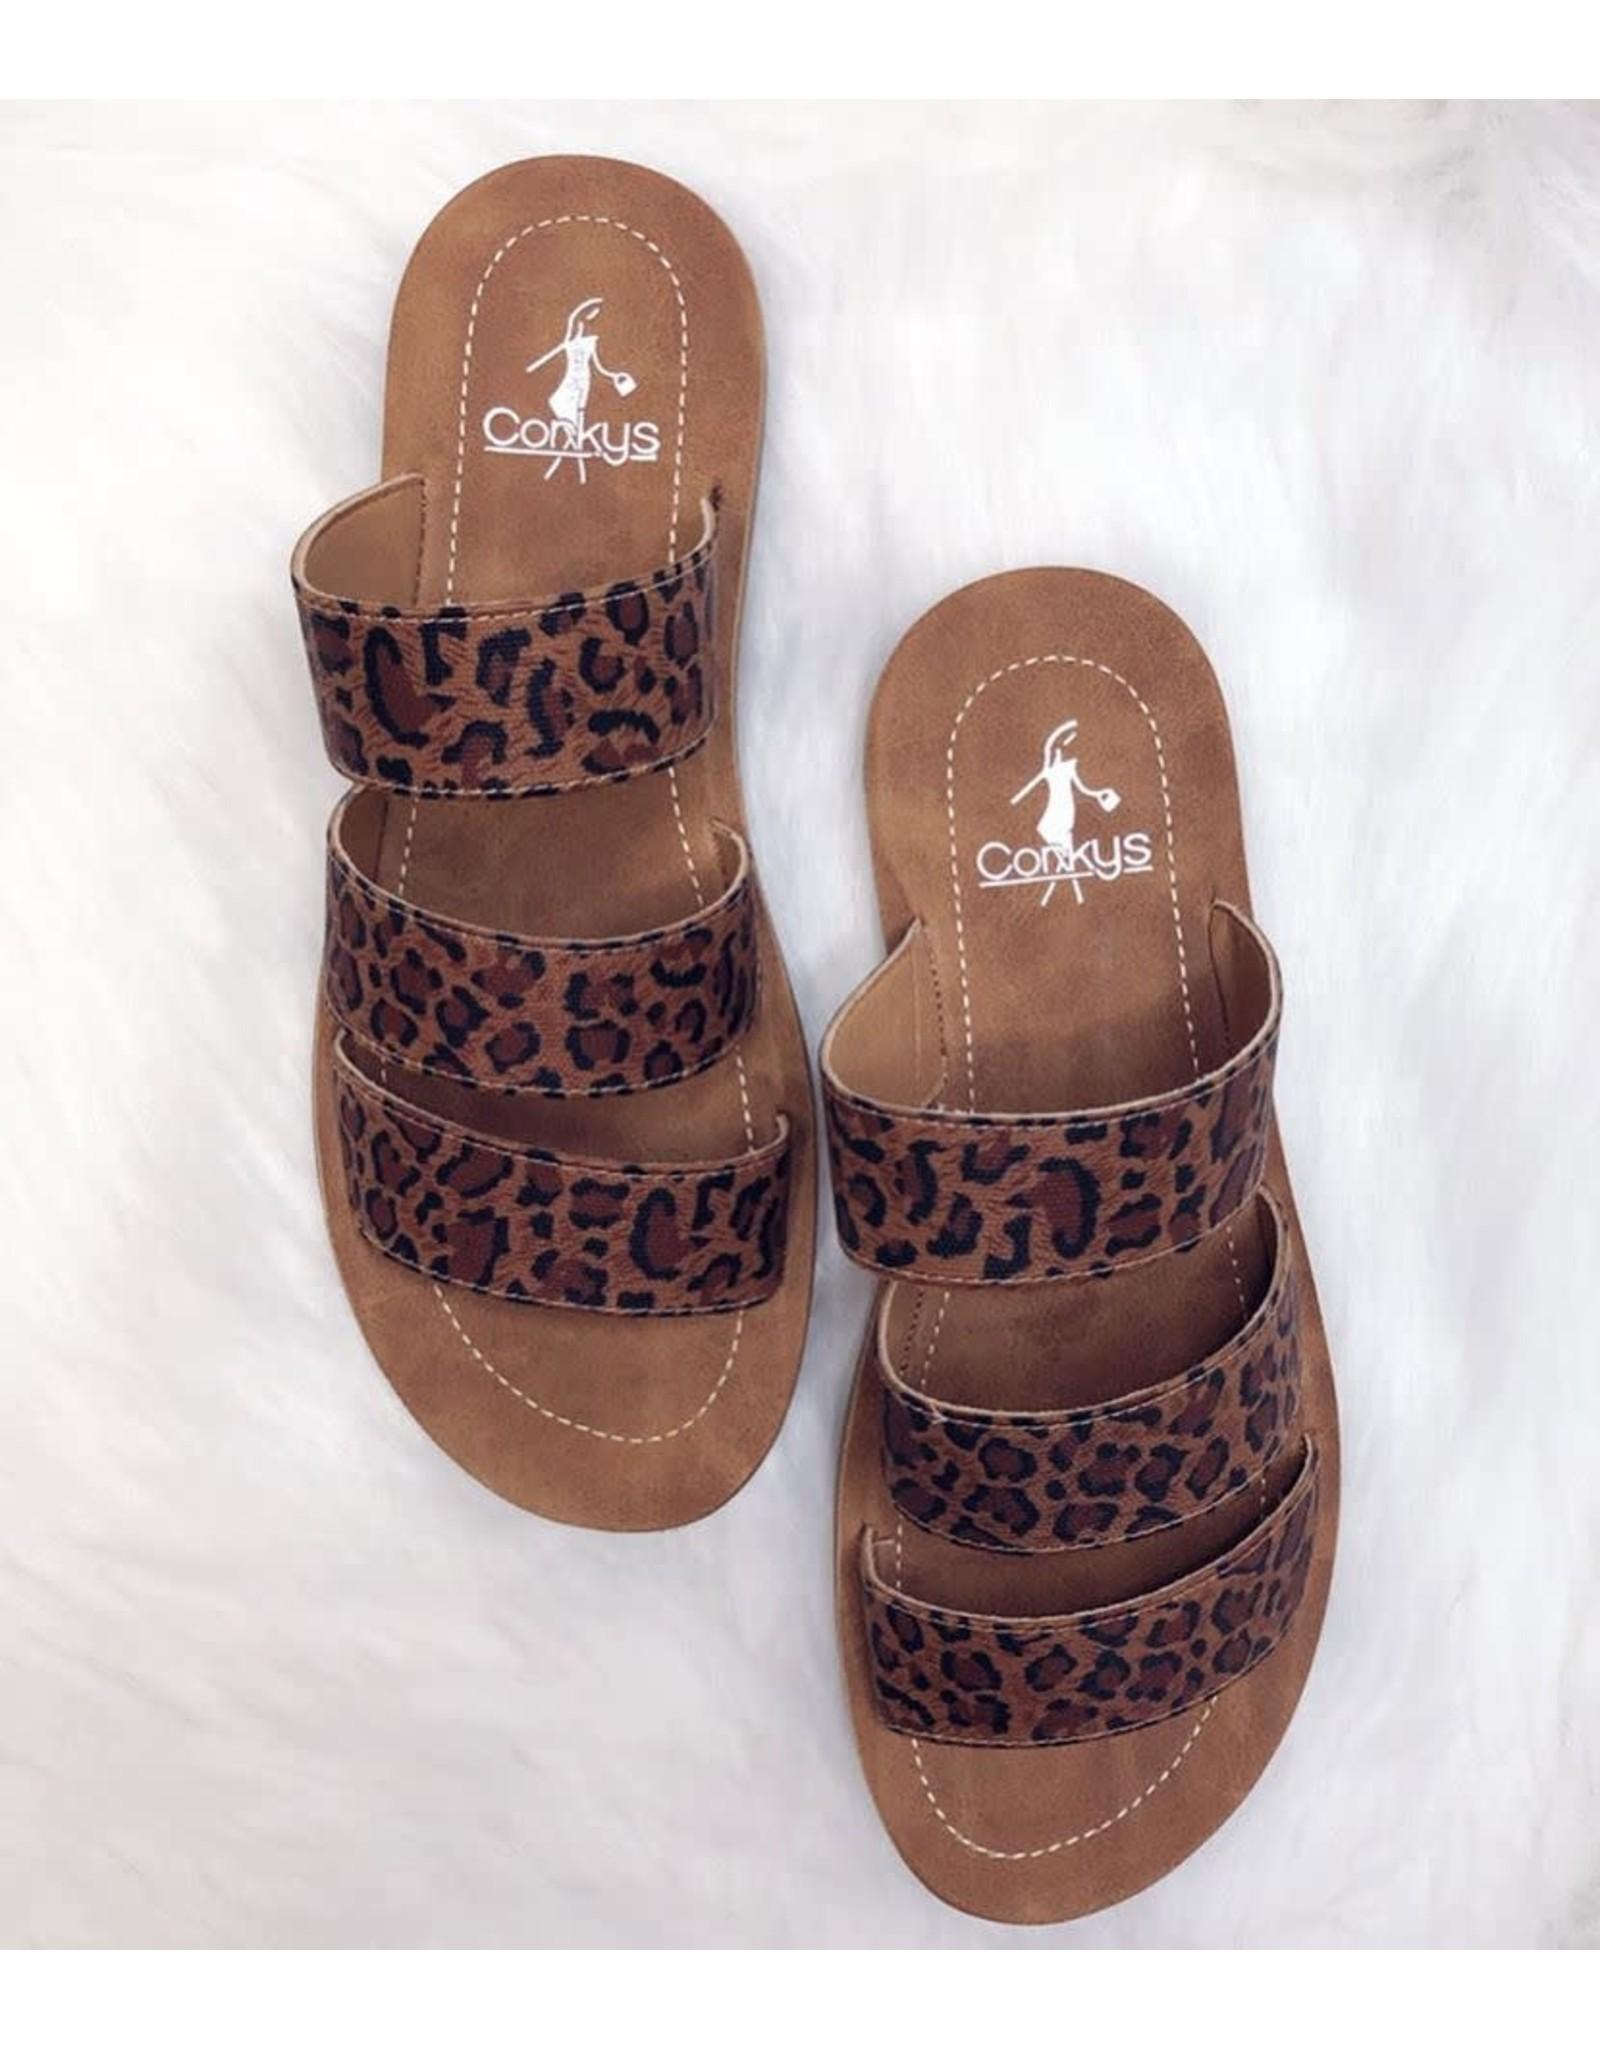 Corky's Dafne-Leopard